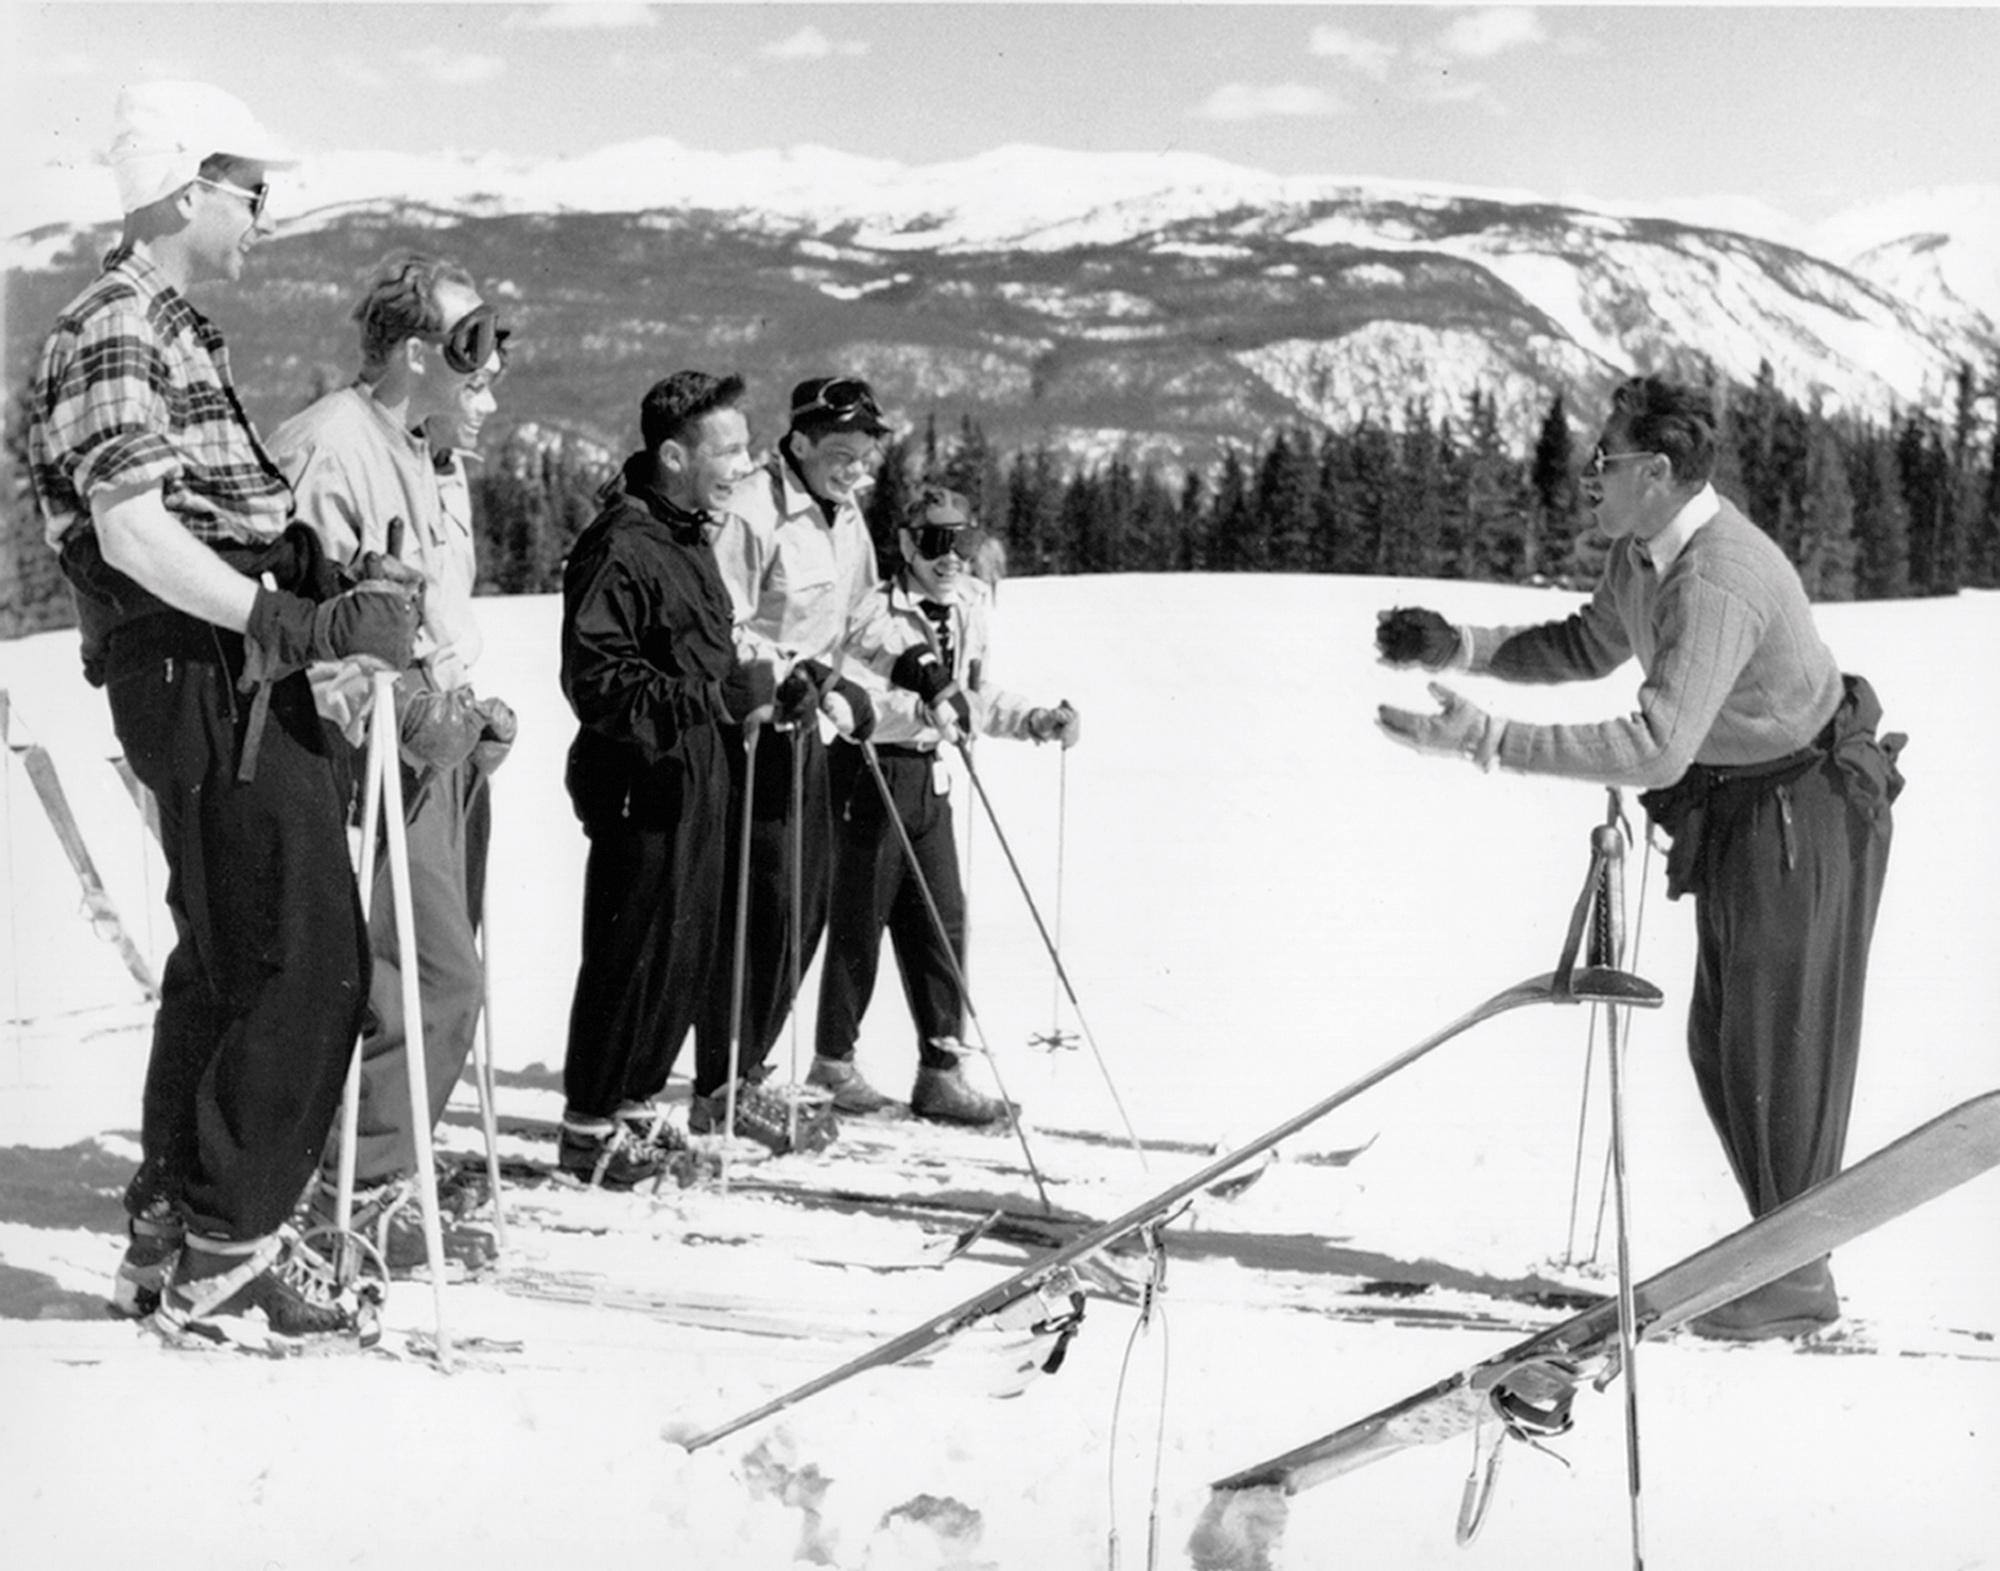 historic photo of klaus teaching ski school